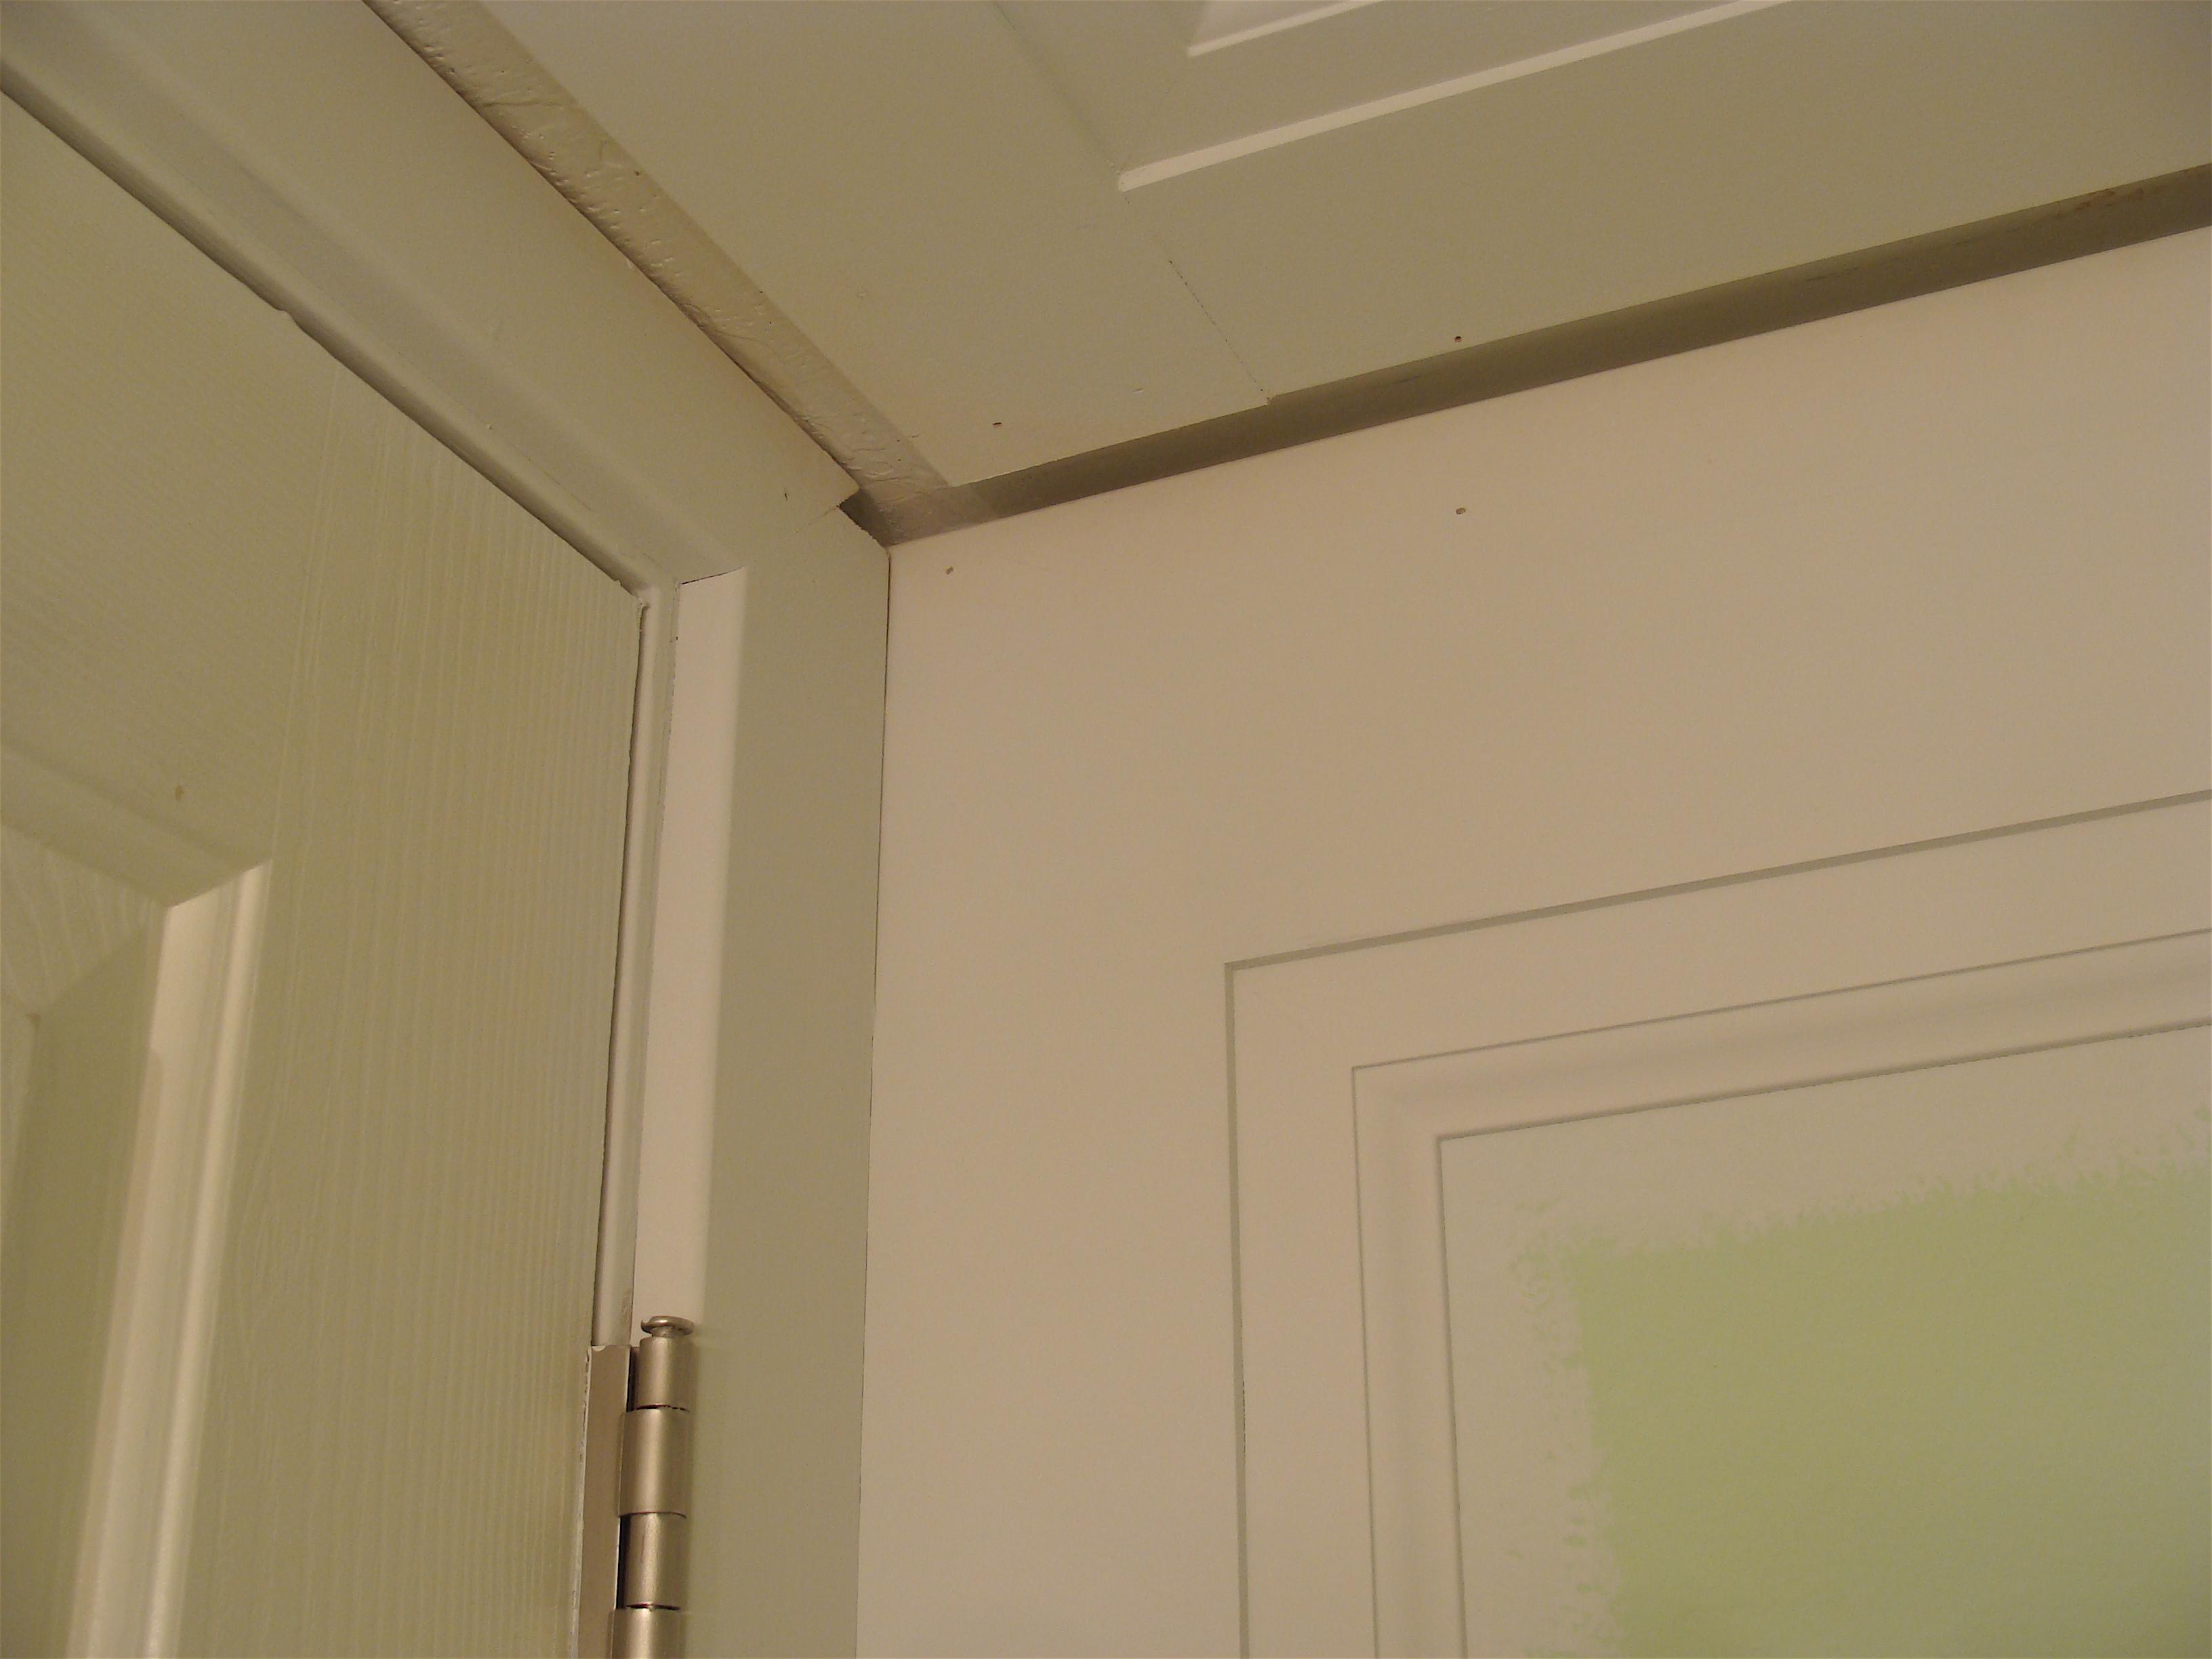 Priming Bathroom Moldings The Joy Of